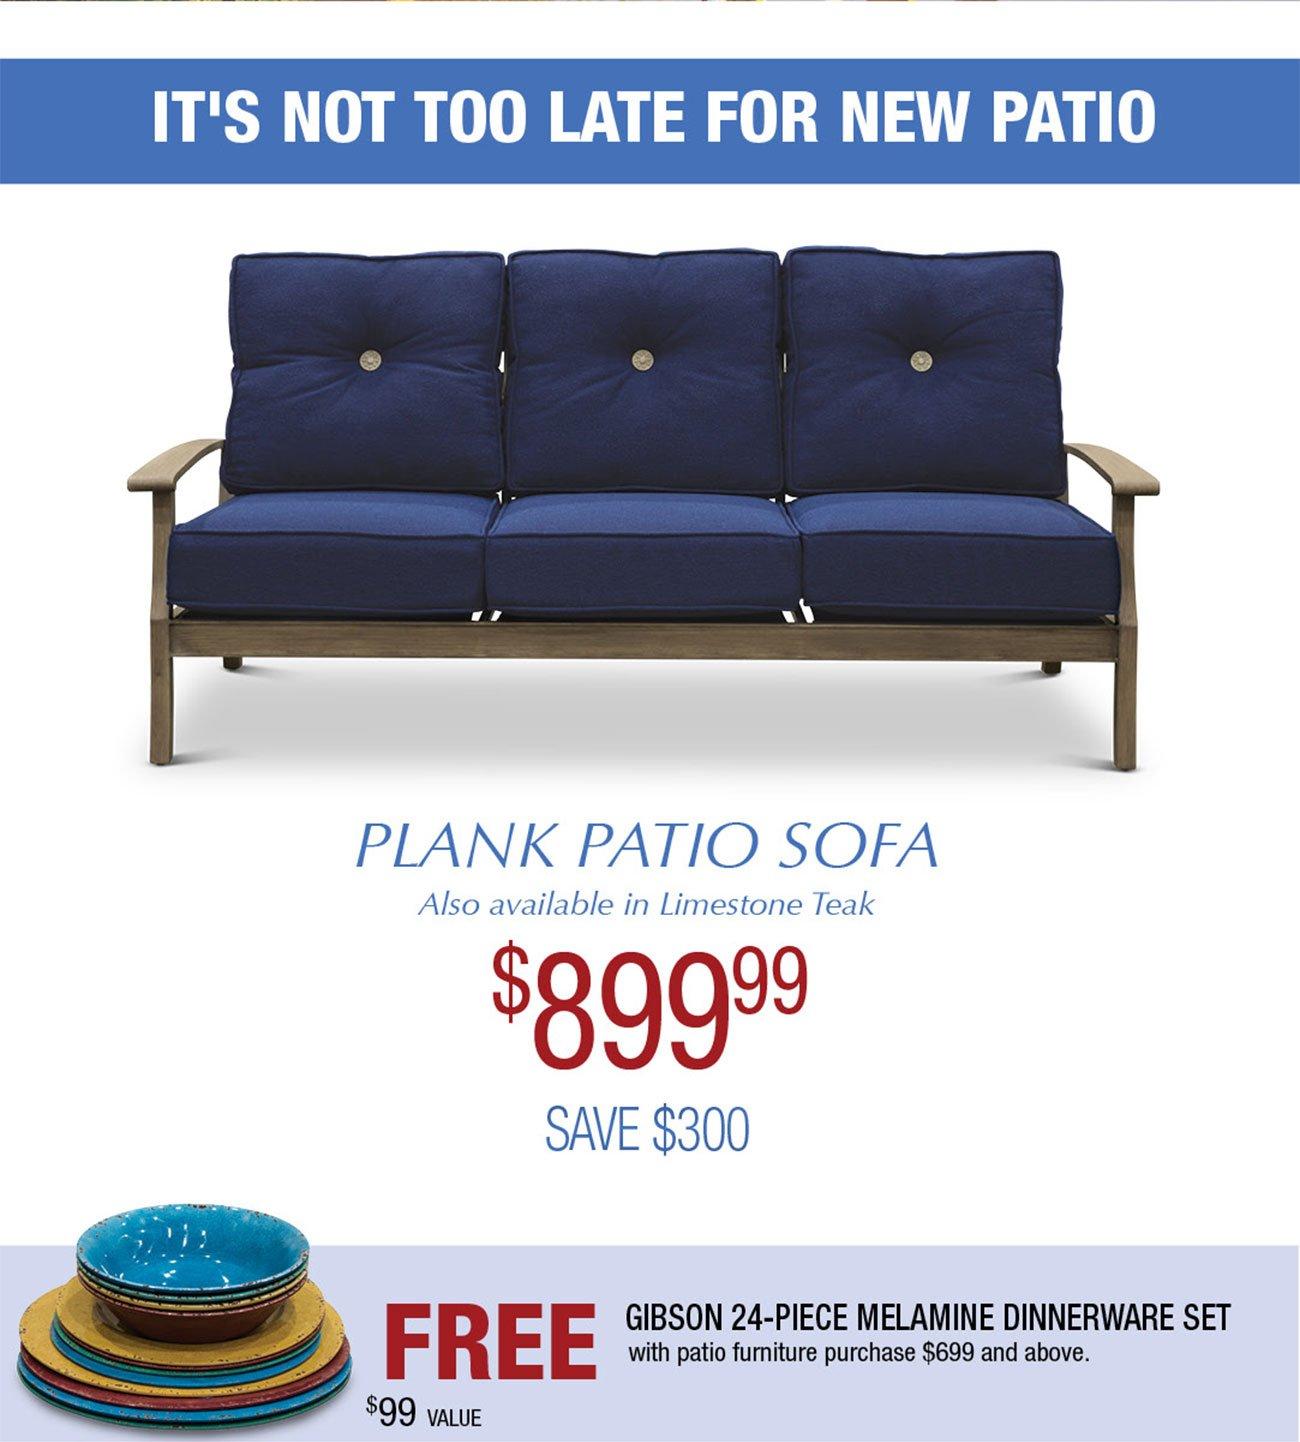 Plank-Patio-Sofa